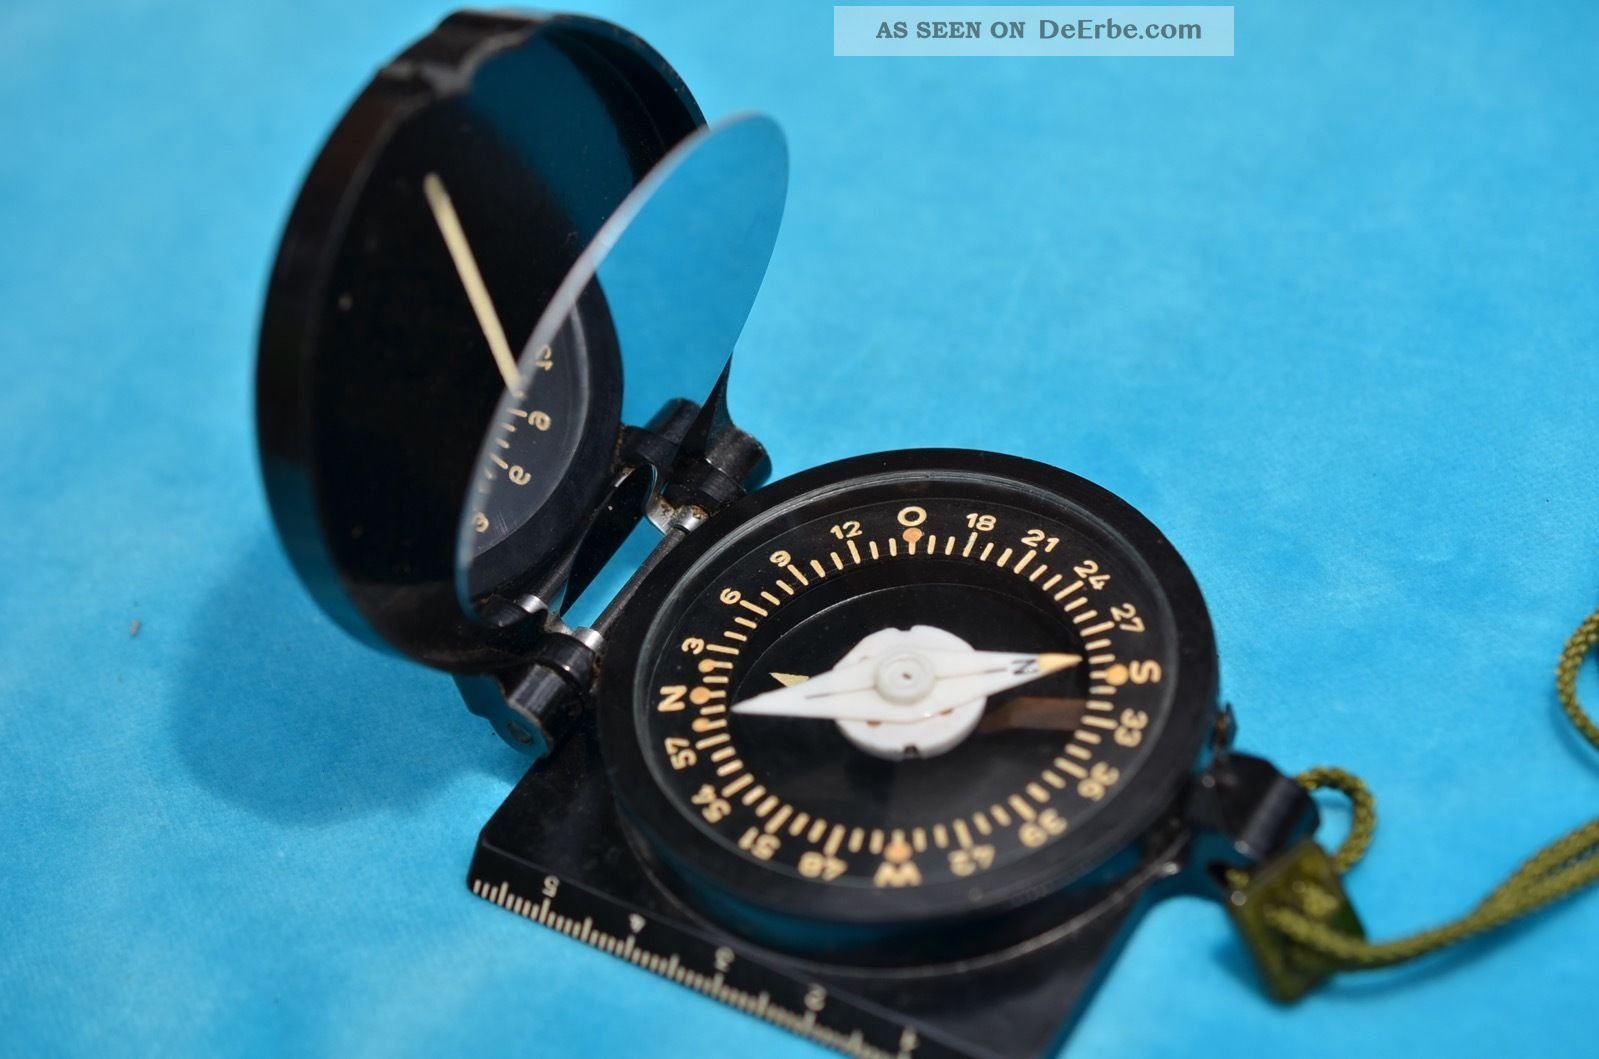 Ddr Freiberger Präzisionsmechanik Marschkompass Spiegelkompass Technik & Instrumente Bild